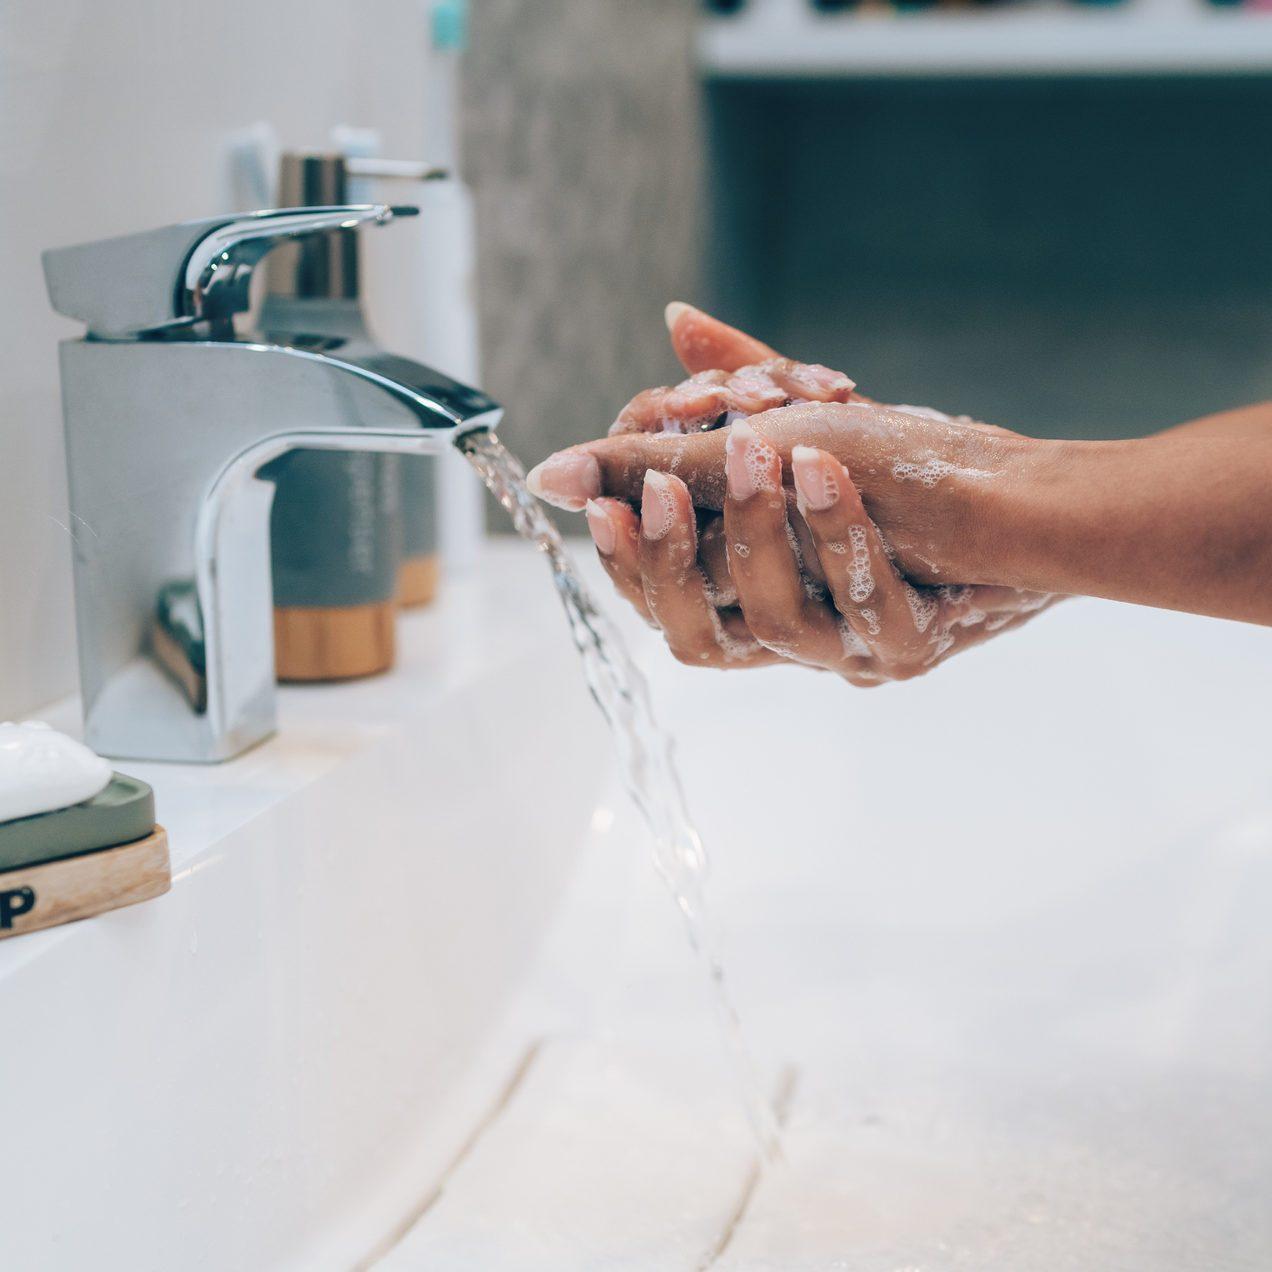 Covid-19 - Washing hands